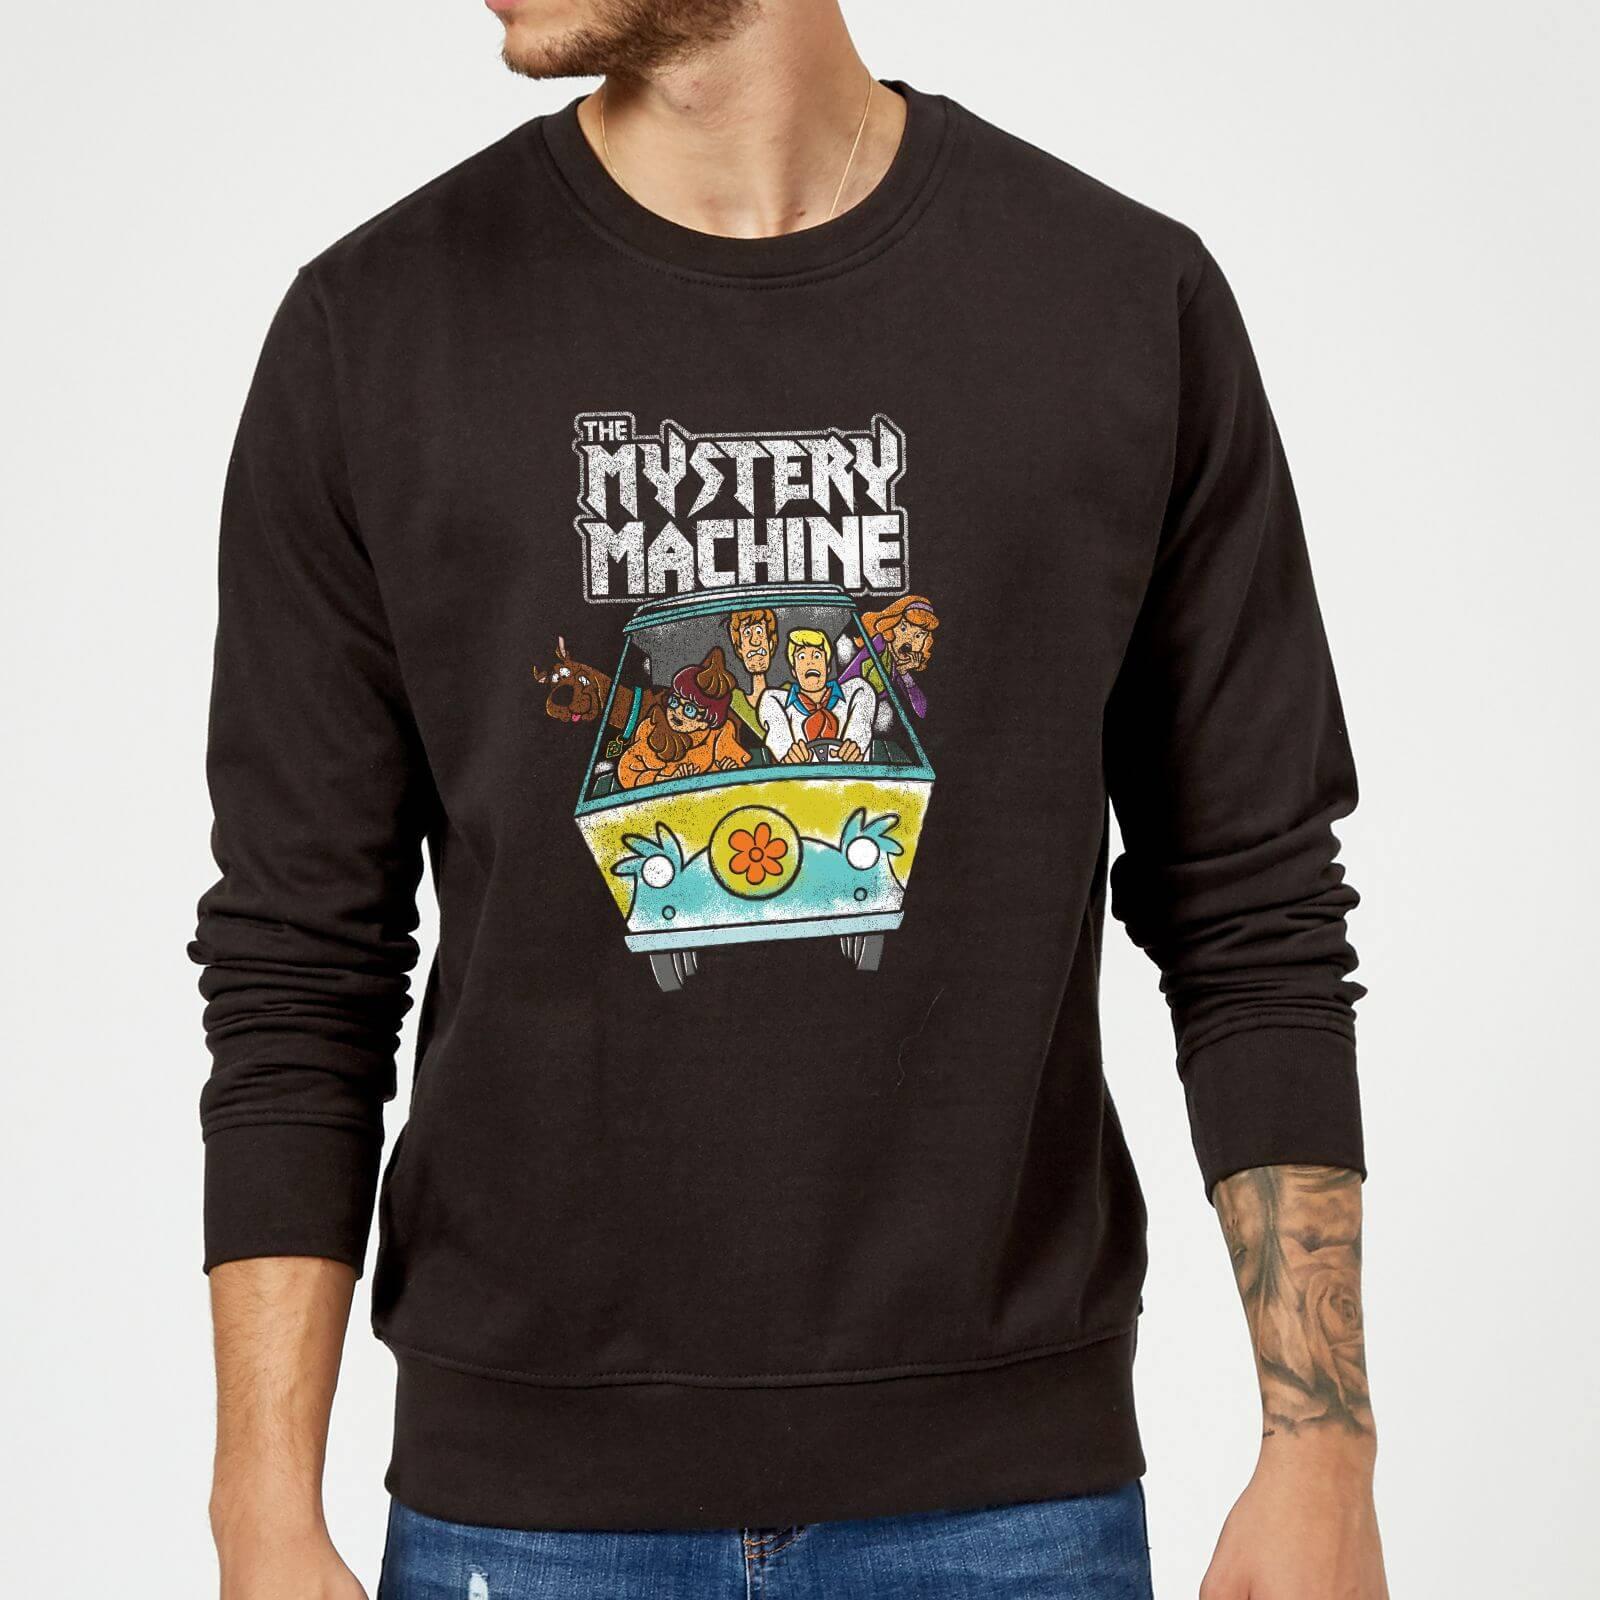 Scooby Doo Mystery Machine Heavy Metal Sweatshirt - Black - M - Black